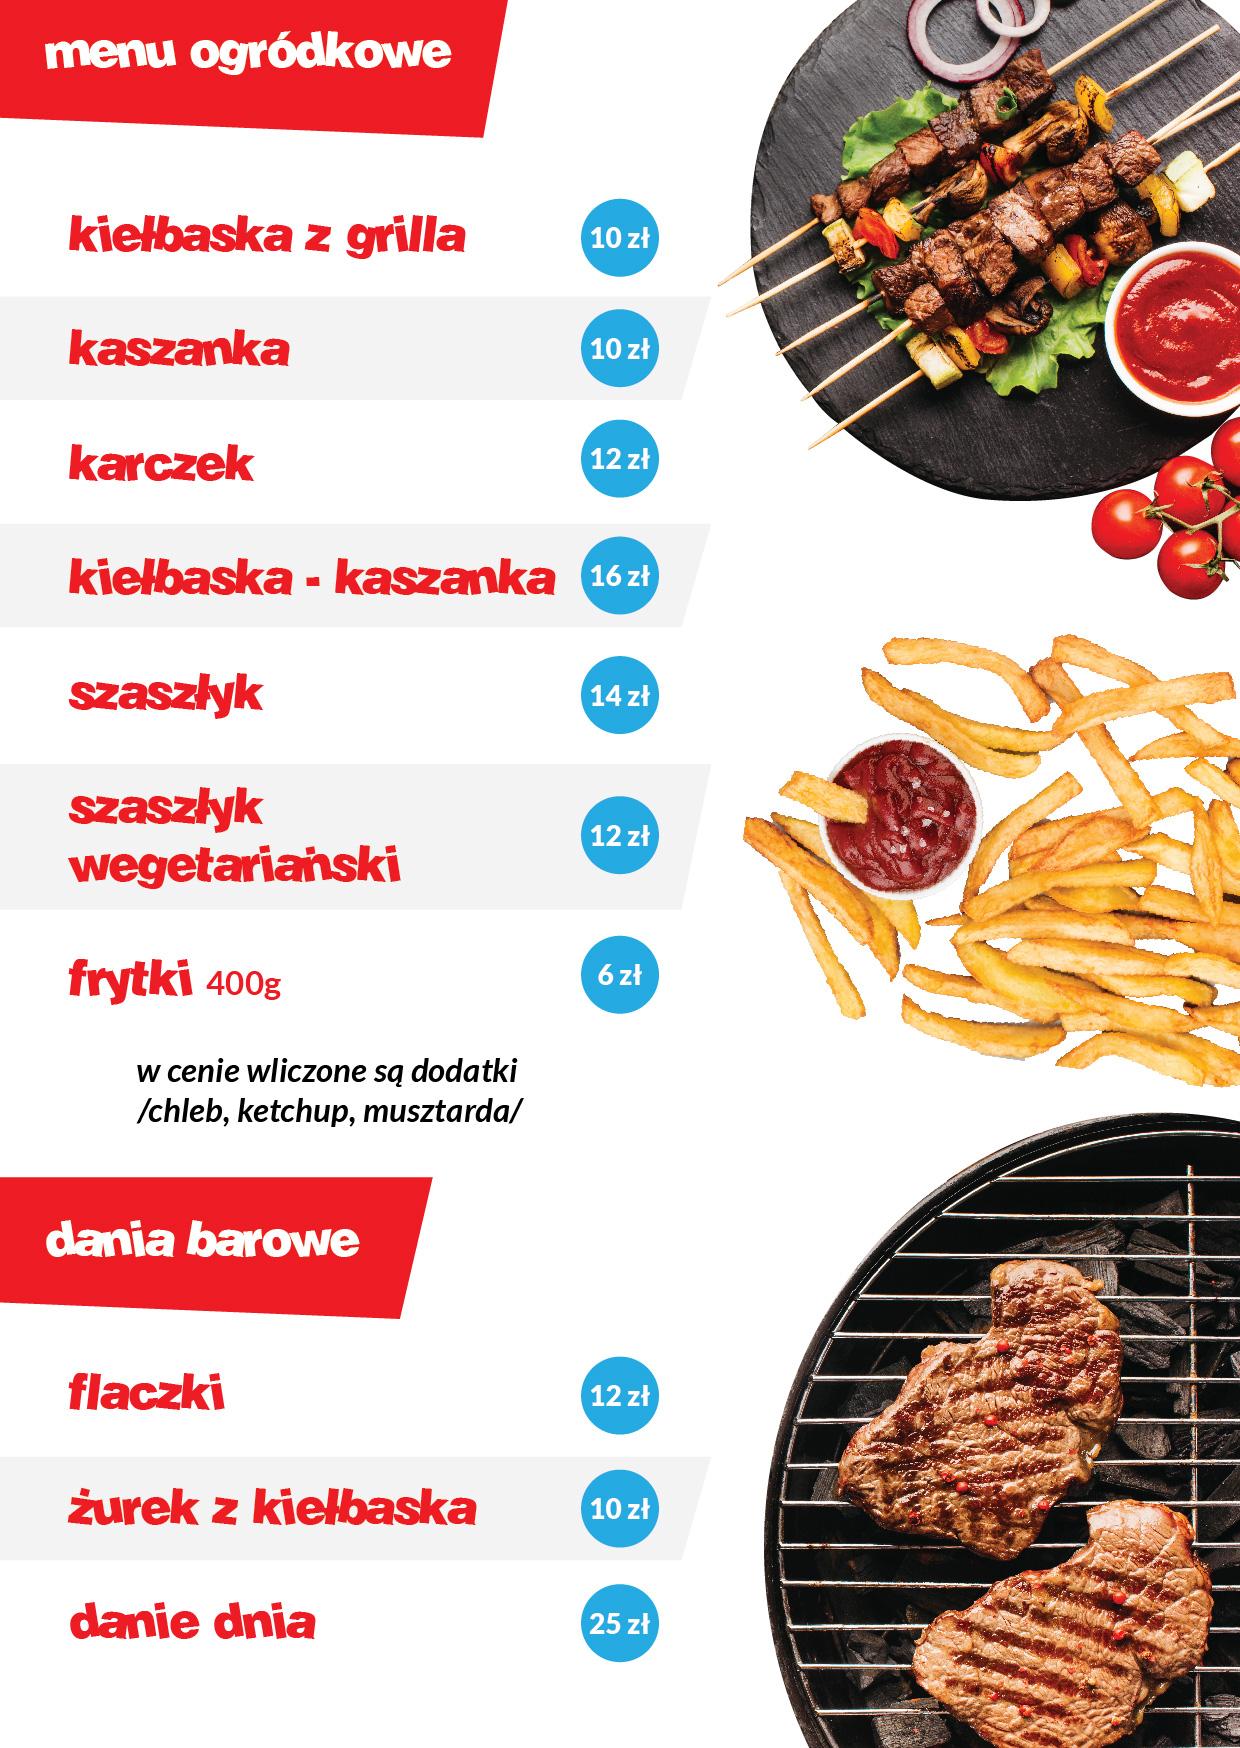 menu-ogródkowe-A6-01-01